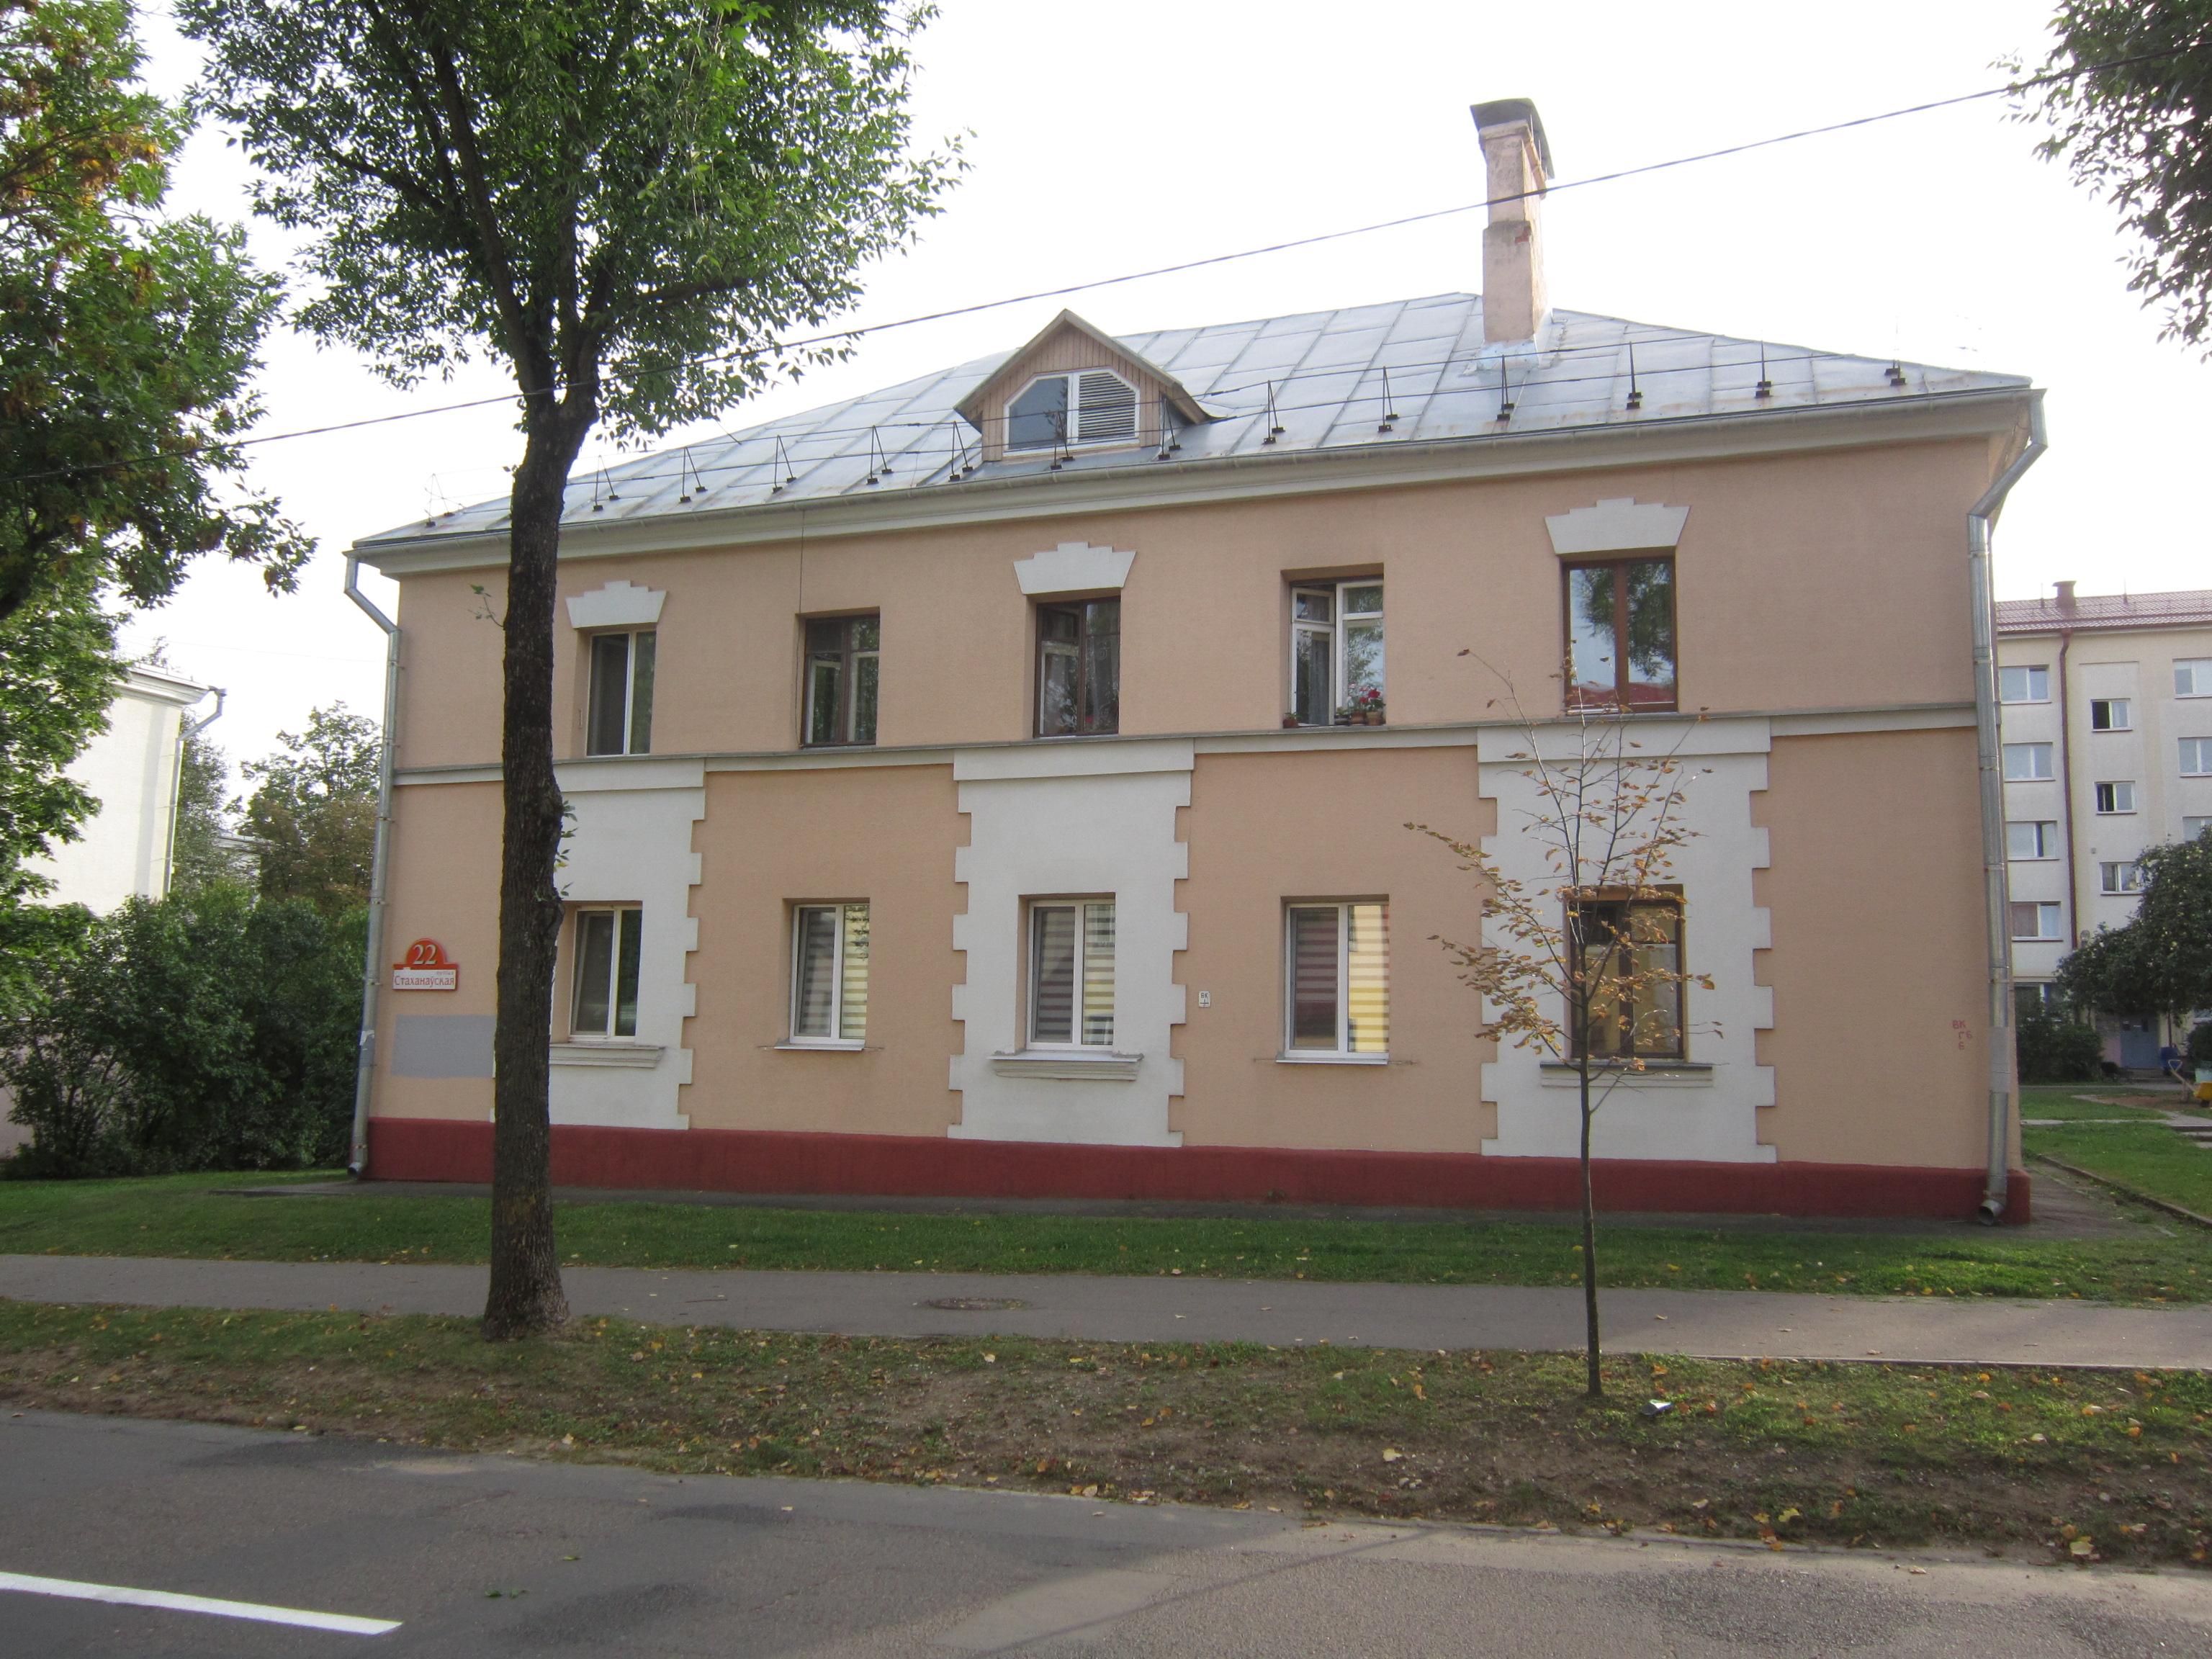 Minsk, Weißrussland. 08 Sep, 2018. MINSK, Weißrussland